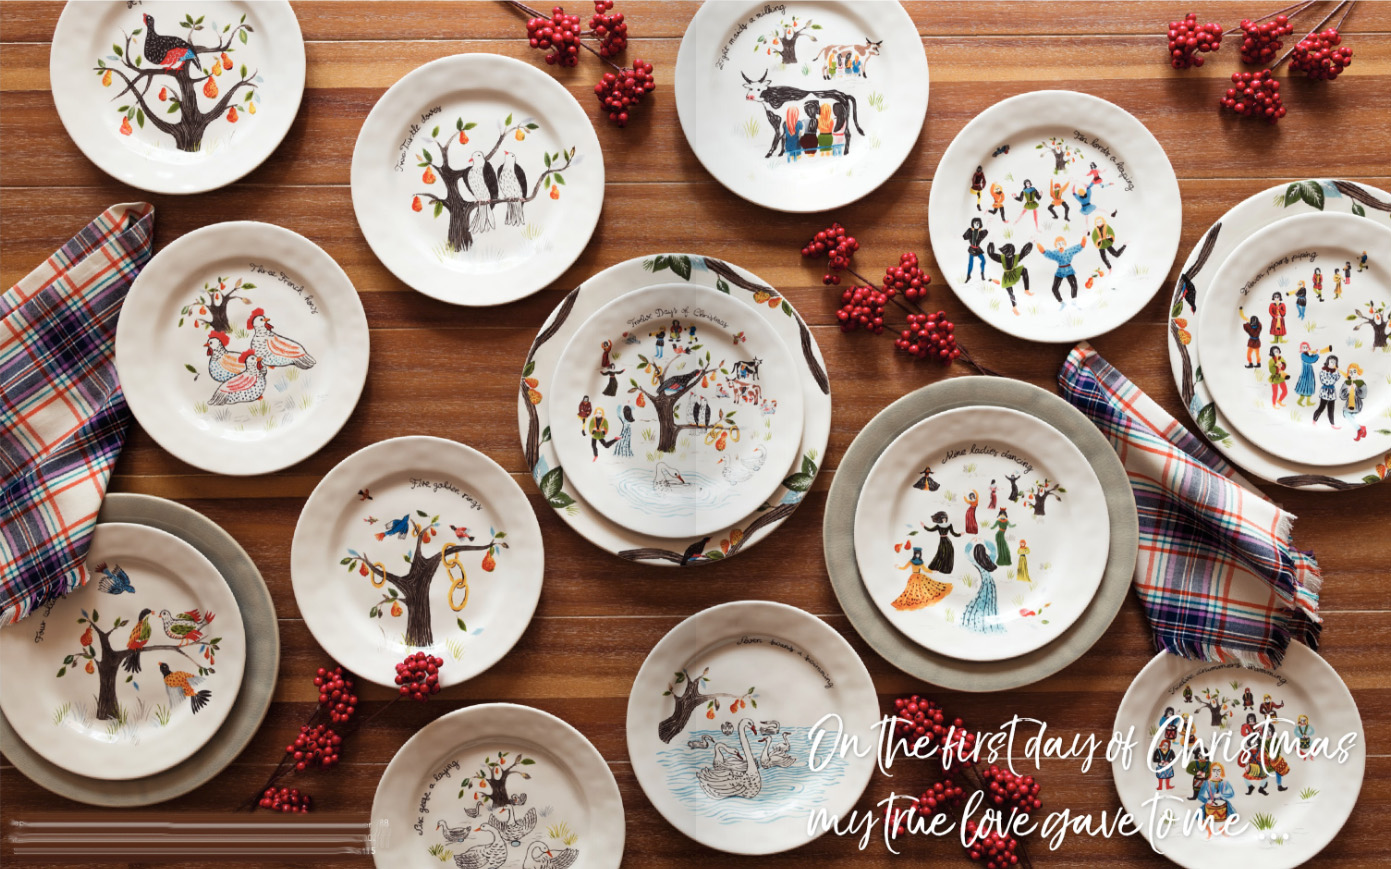 Juliska 12 Days of Christmas Dinnerware